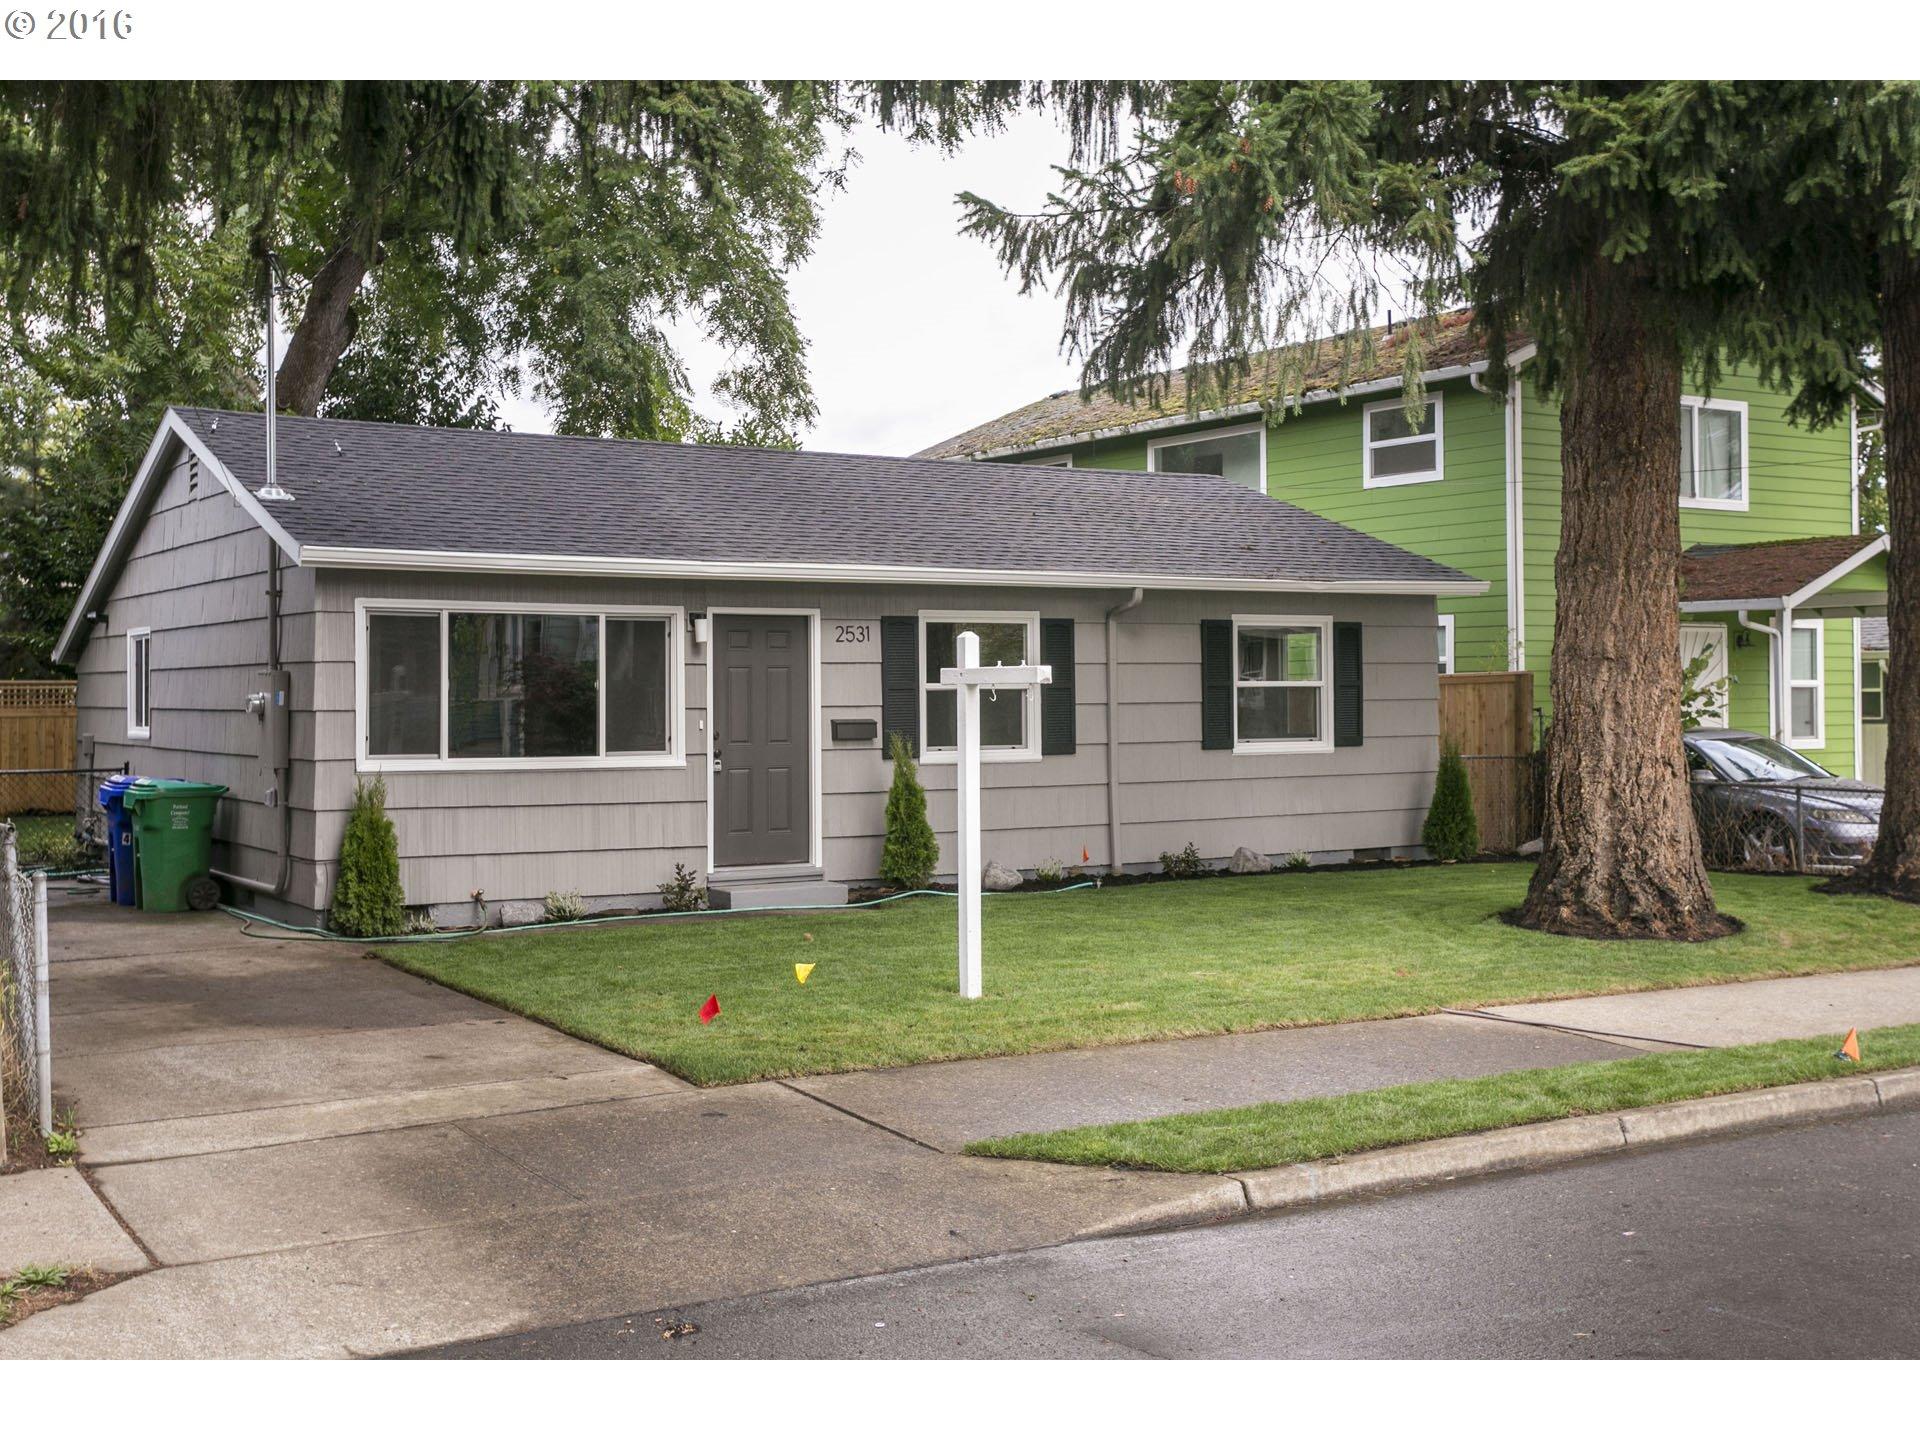 2531 N ARGYLE ST, Portland, OR 97217